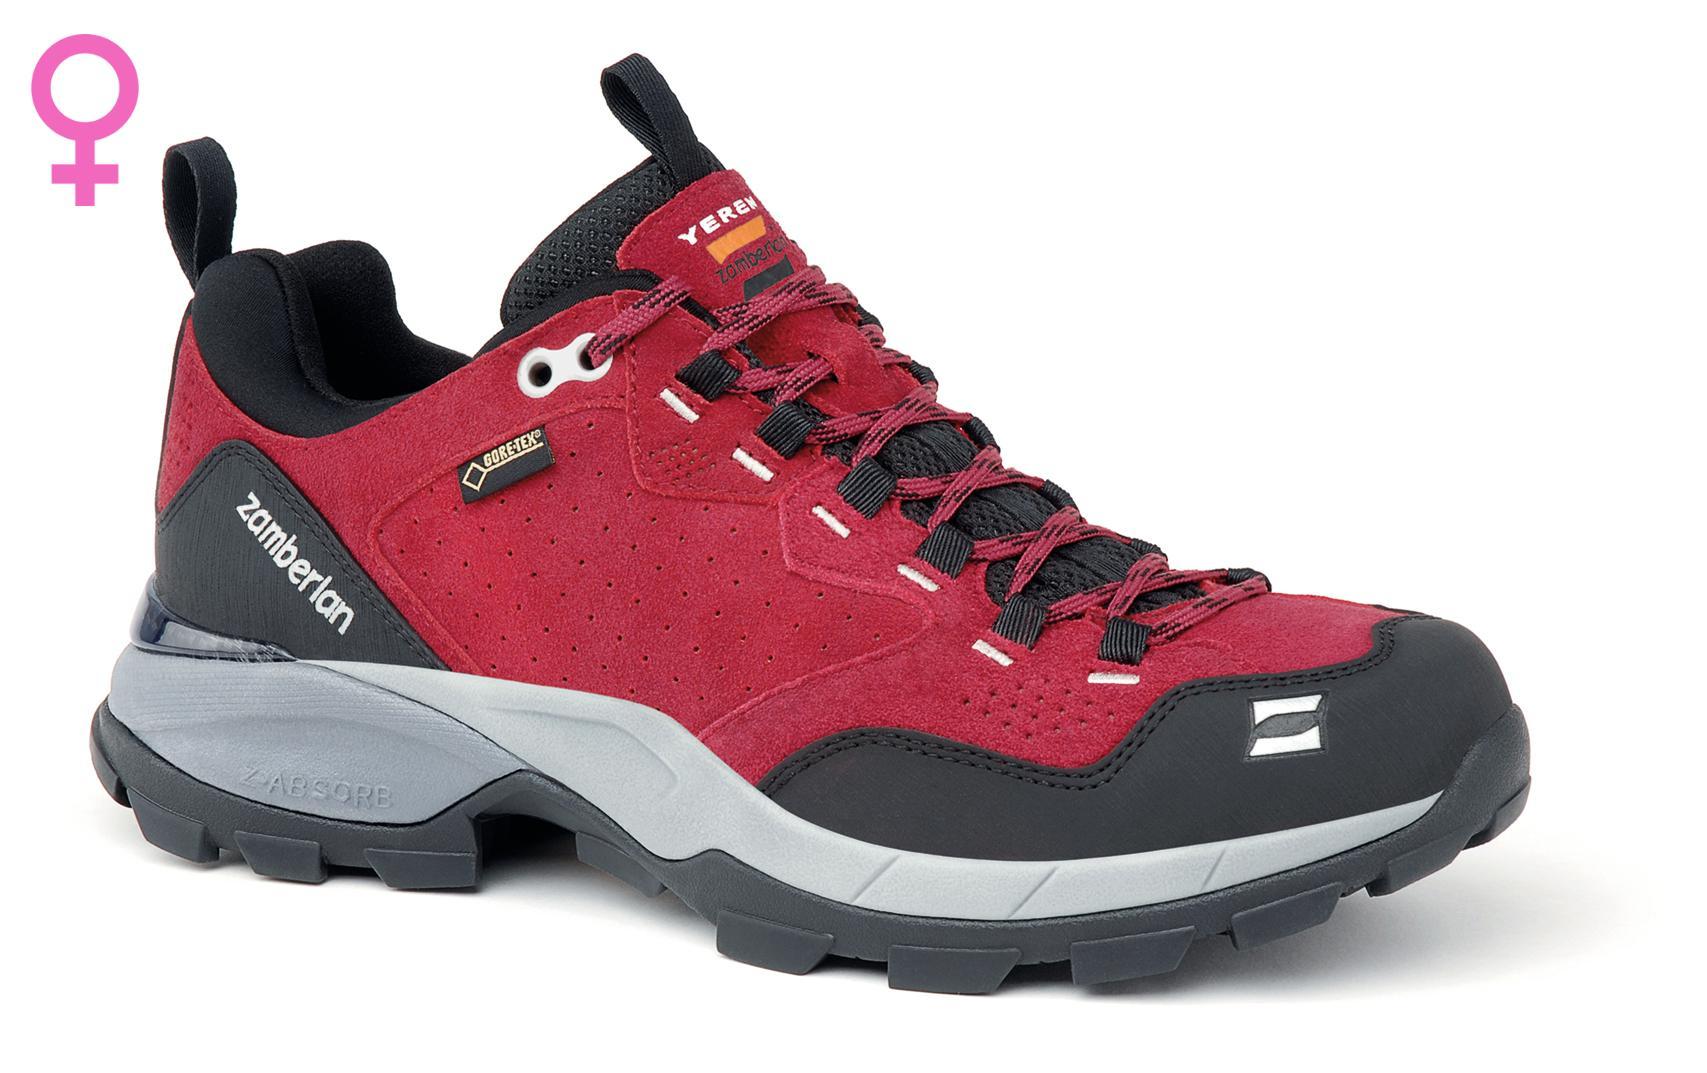 152 YEREN LOW GTX® RR WNS   -   Zapatos de  Senderismo   -   Gerbera